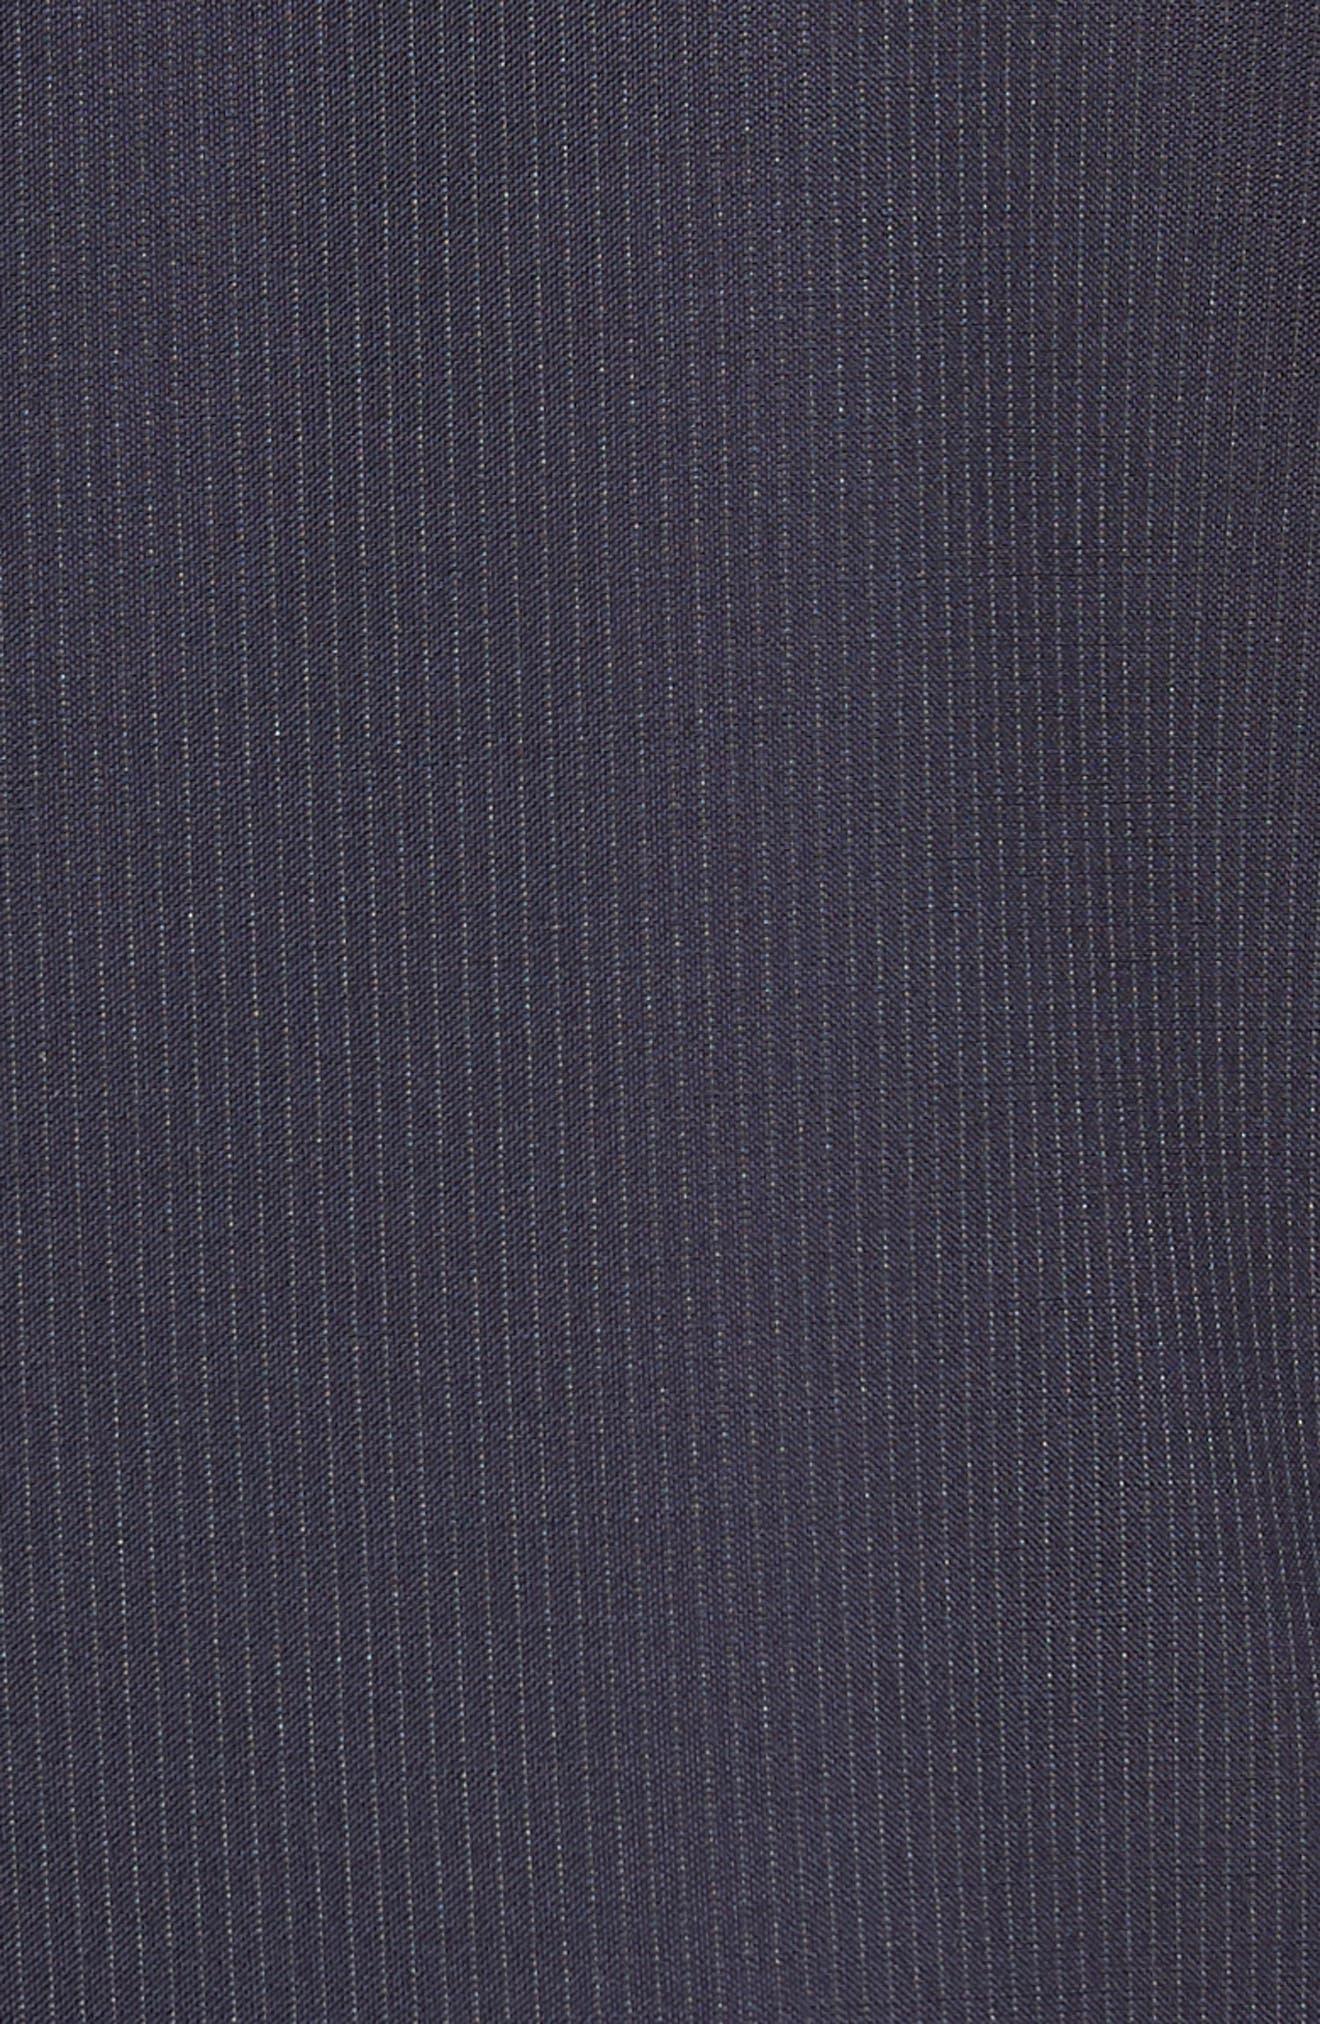 Jay Trim Fit Stripe Wool Suit,                             Alternate thumbnail 8, color,                             NAVY